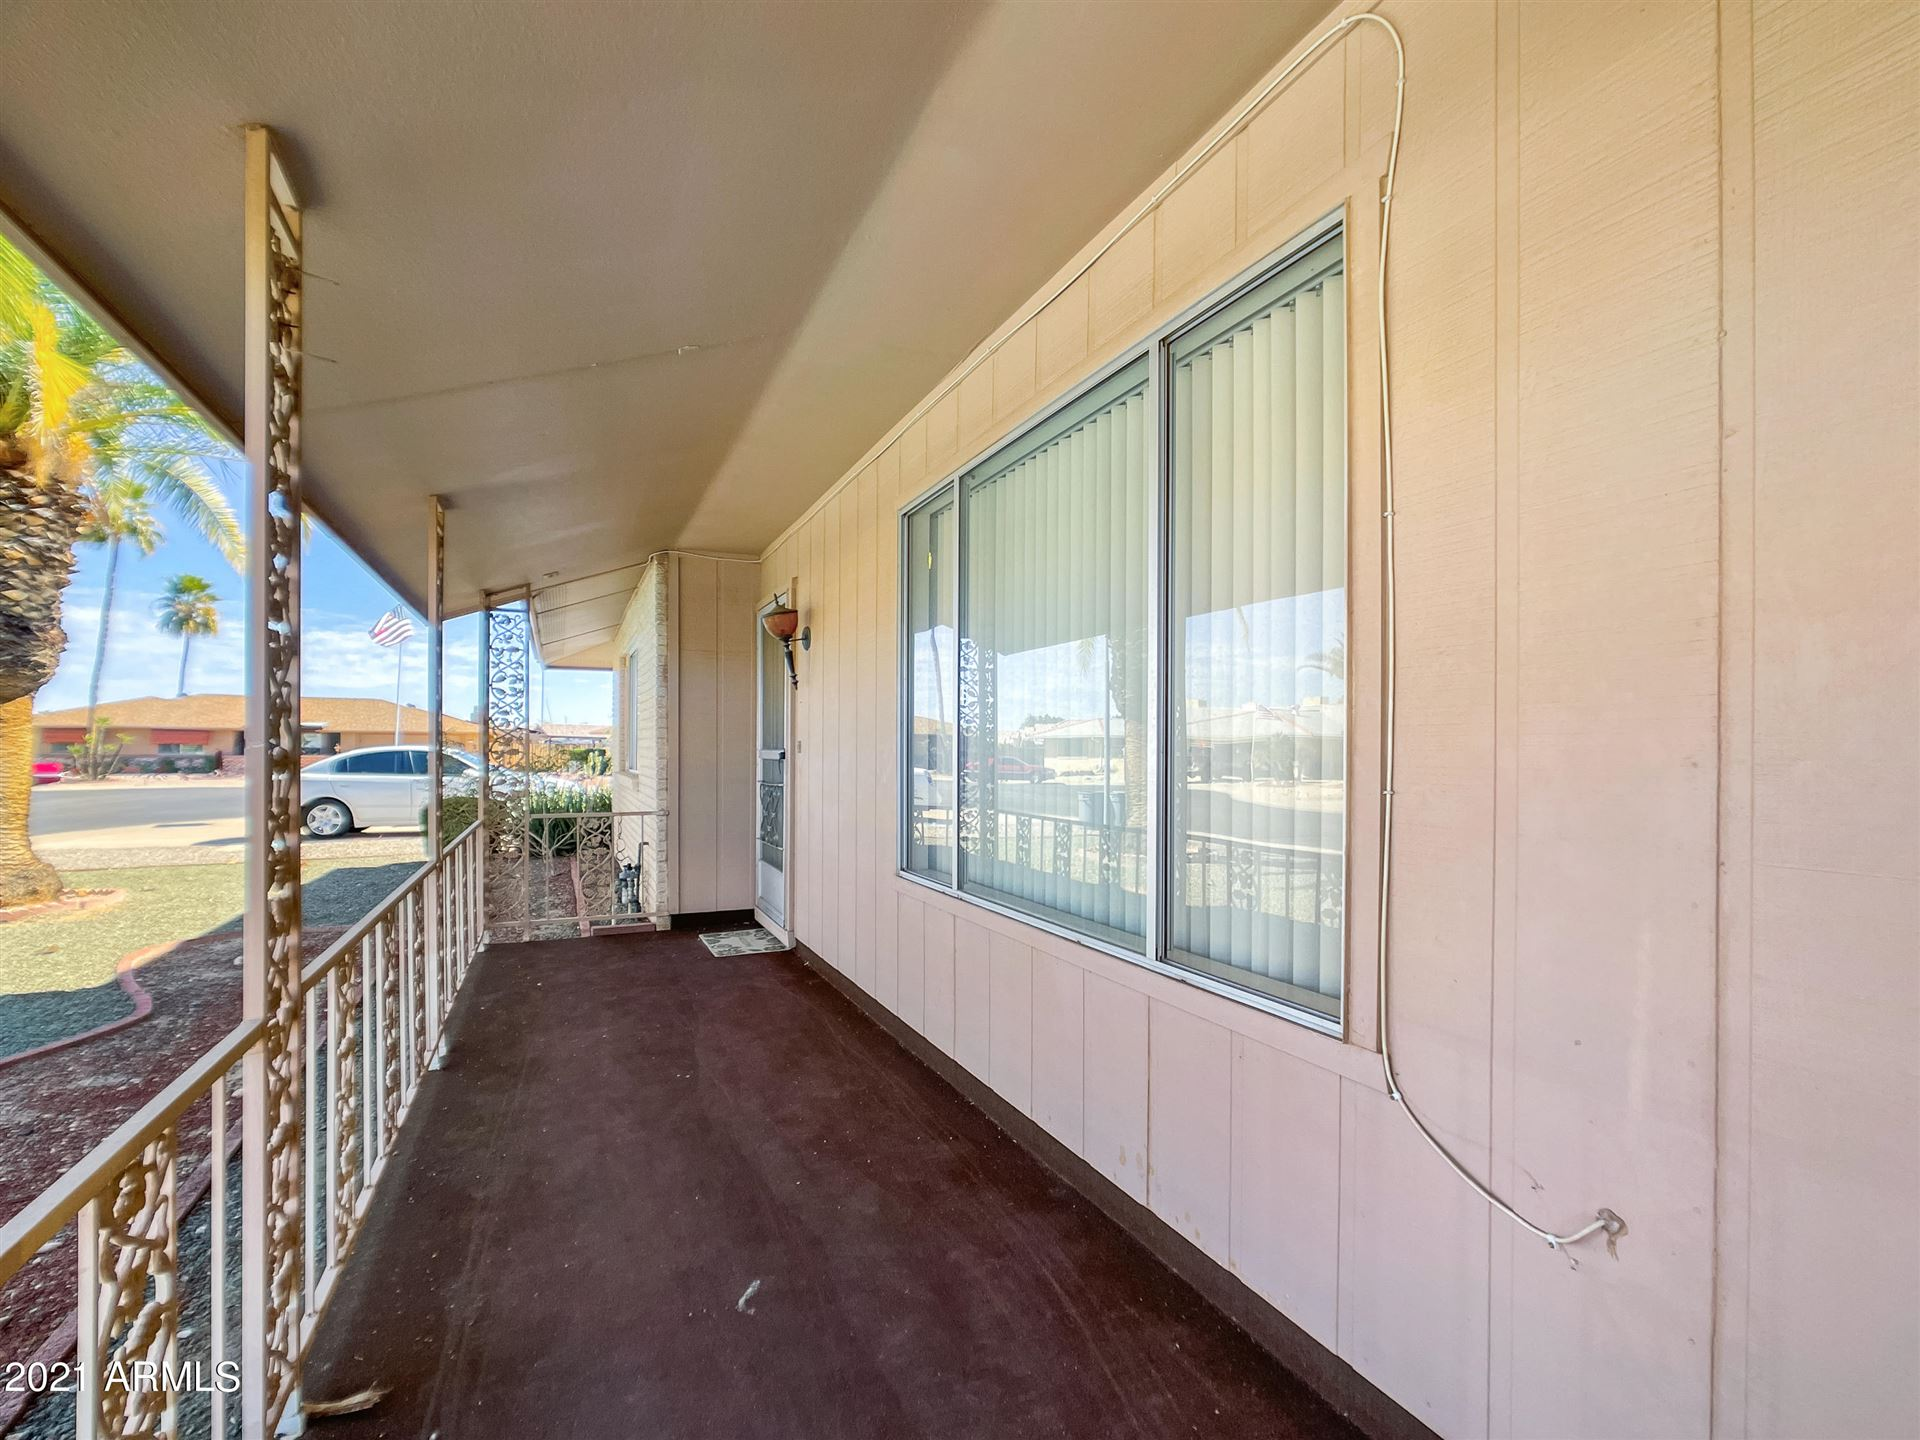 Photo of 9113 W WILLOW HAVEN Court, Sun City, AZ 85351 (MLS # 6189784)